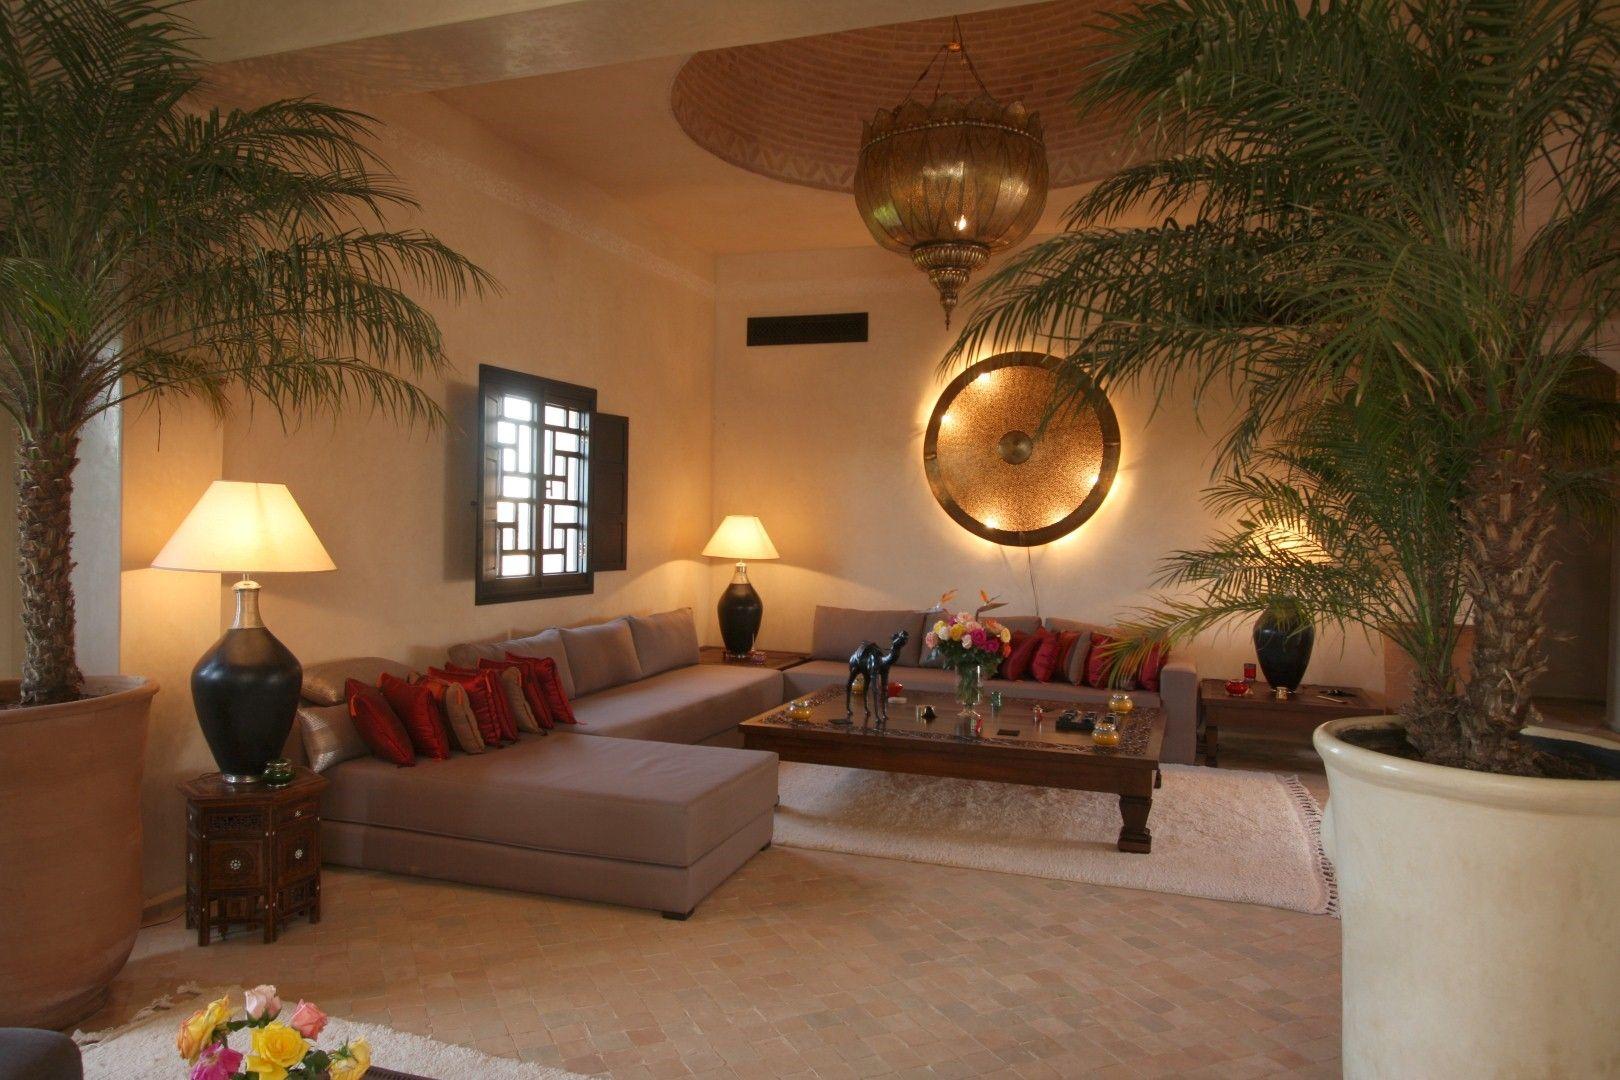 Salon Marocain -Moroccan | Moroccan Houses decoration ...